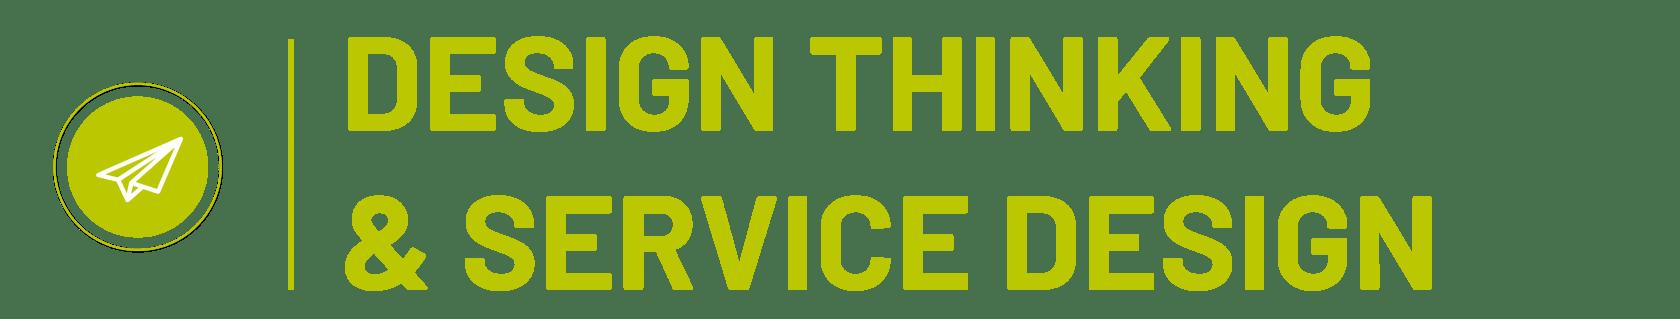 Header DESIGNTHINKING&SERVICEDESIGNcerchio-01